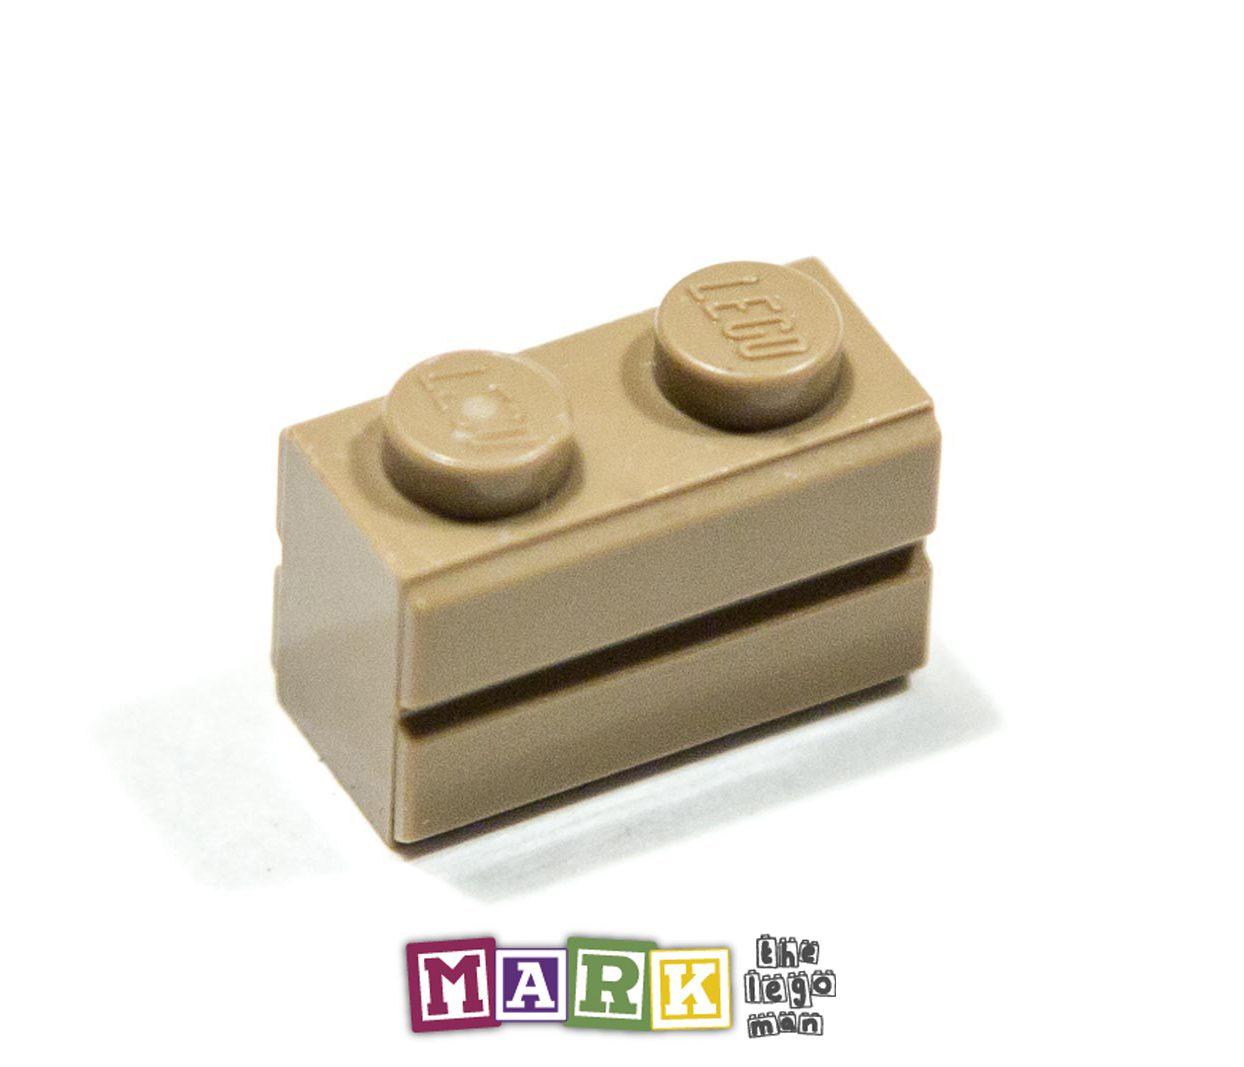 Lego 98283 1x2 Profile Brick Single Grove 4646577